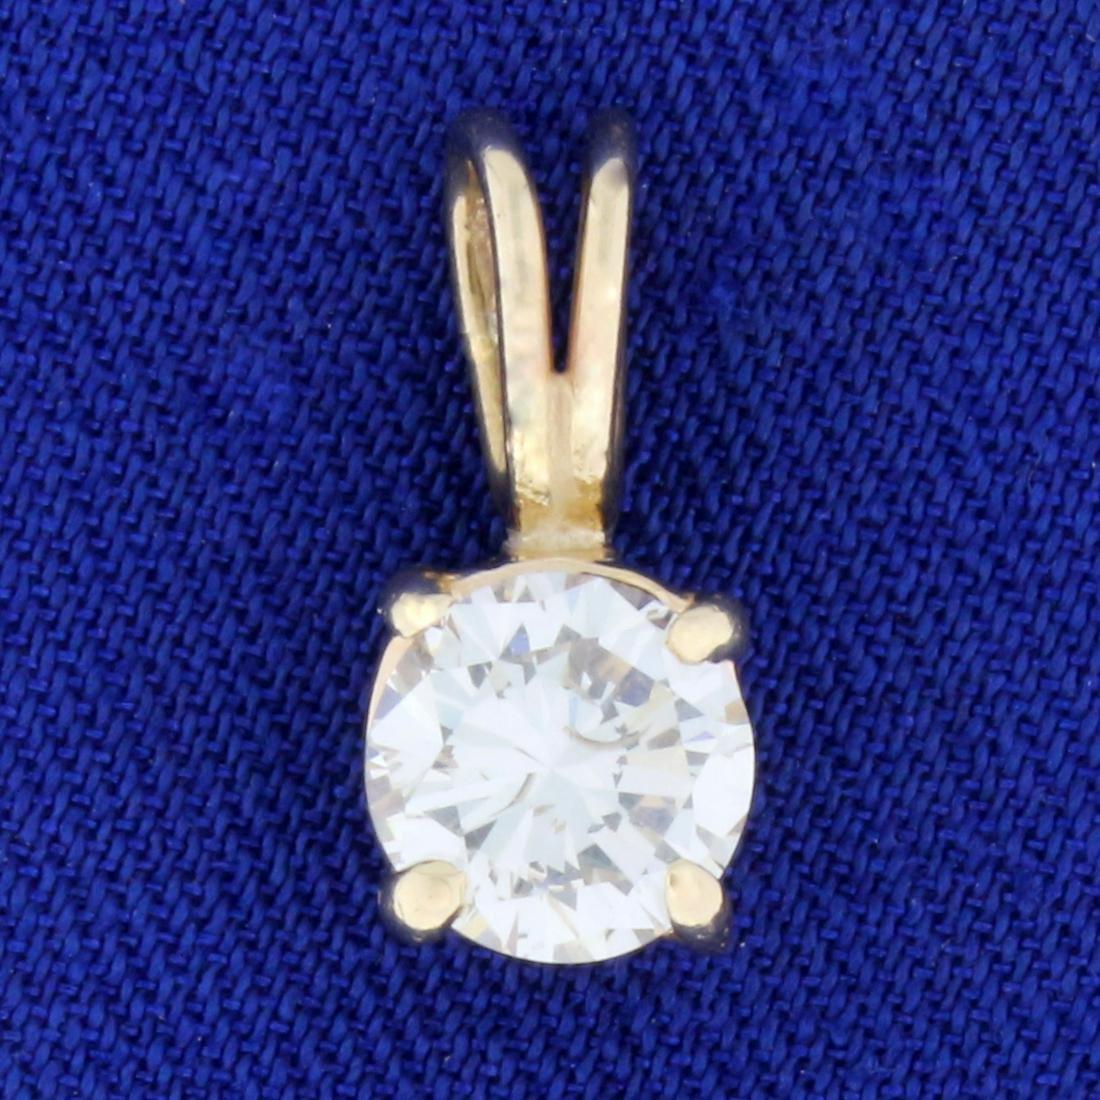 .9ct Solitaire Diamond Pendant in 14k Yellow Gold